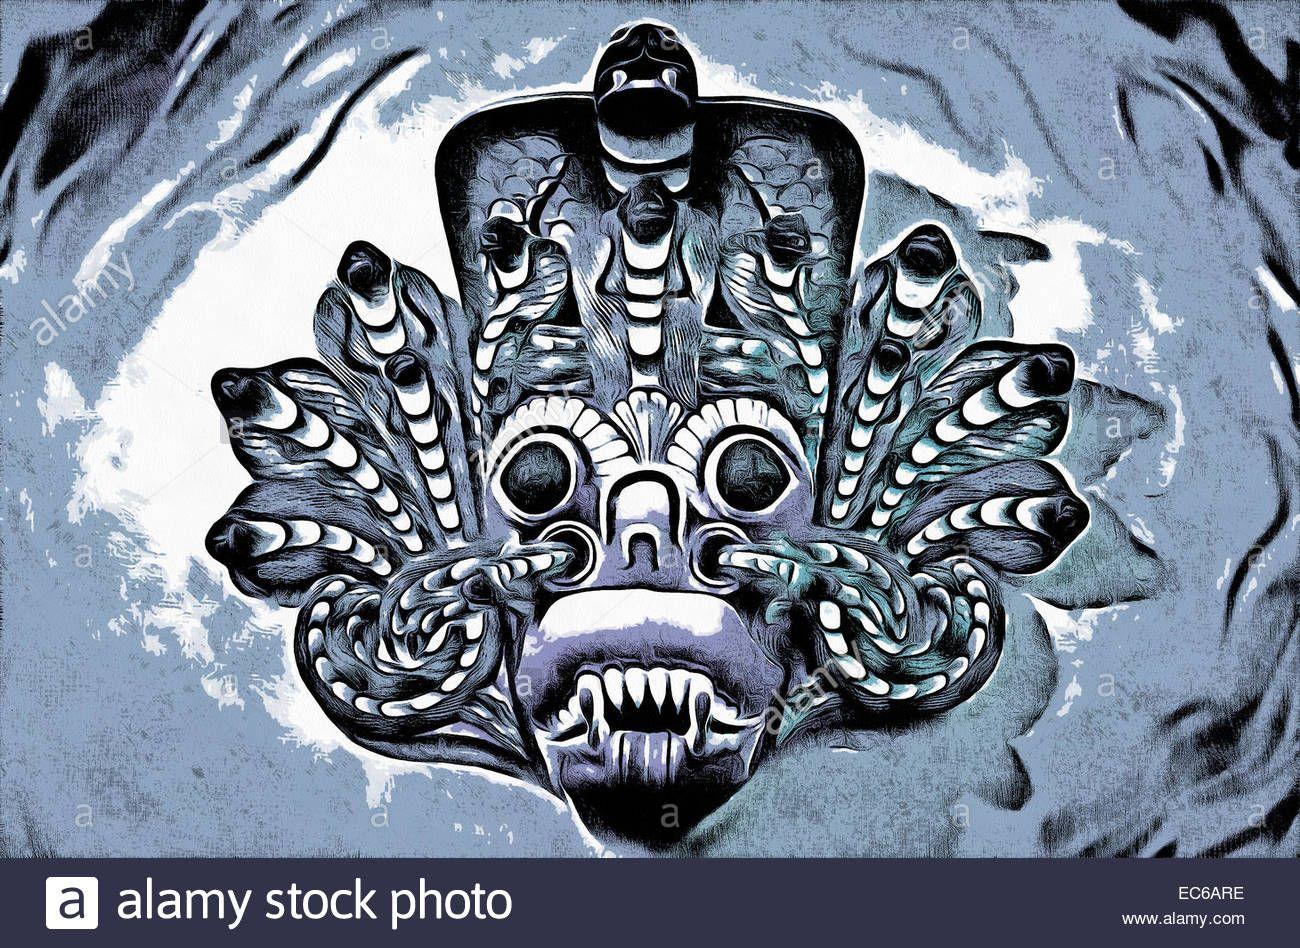 Download this stock image Illustration, masks, Lankan